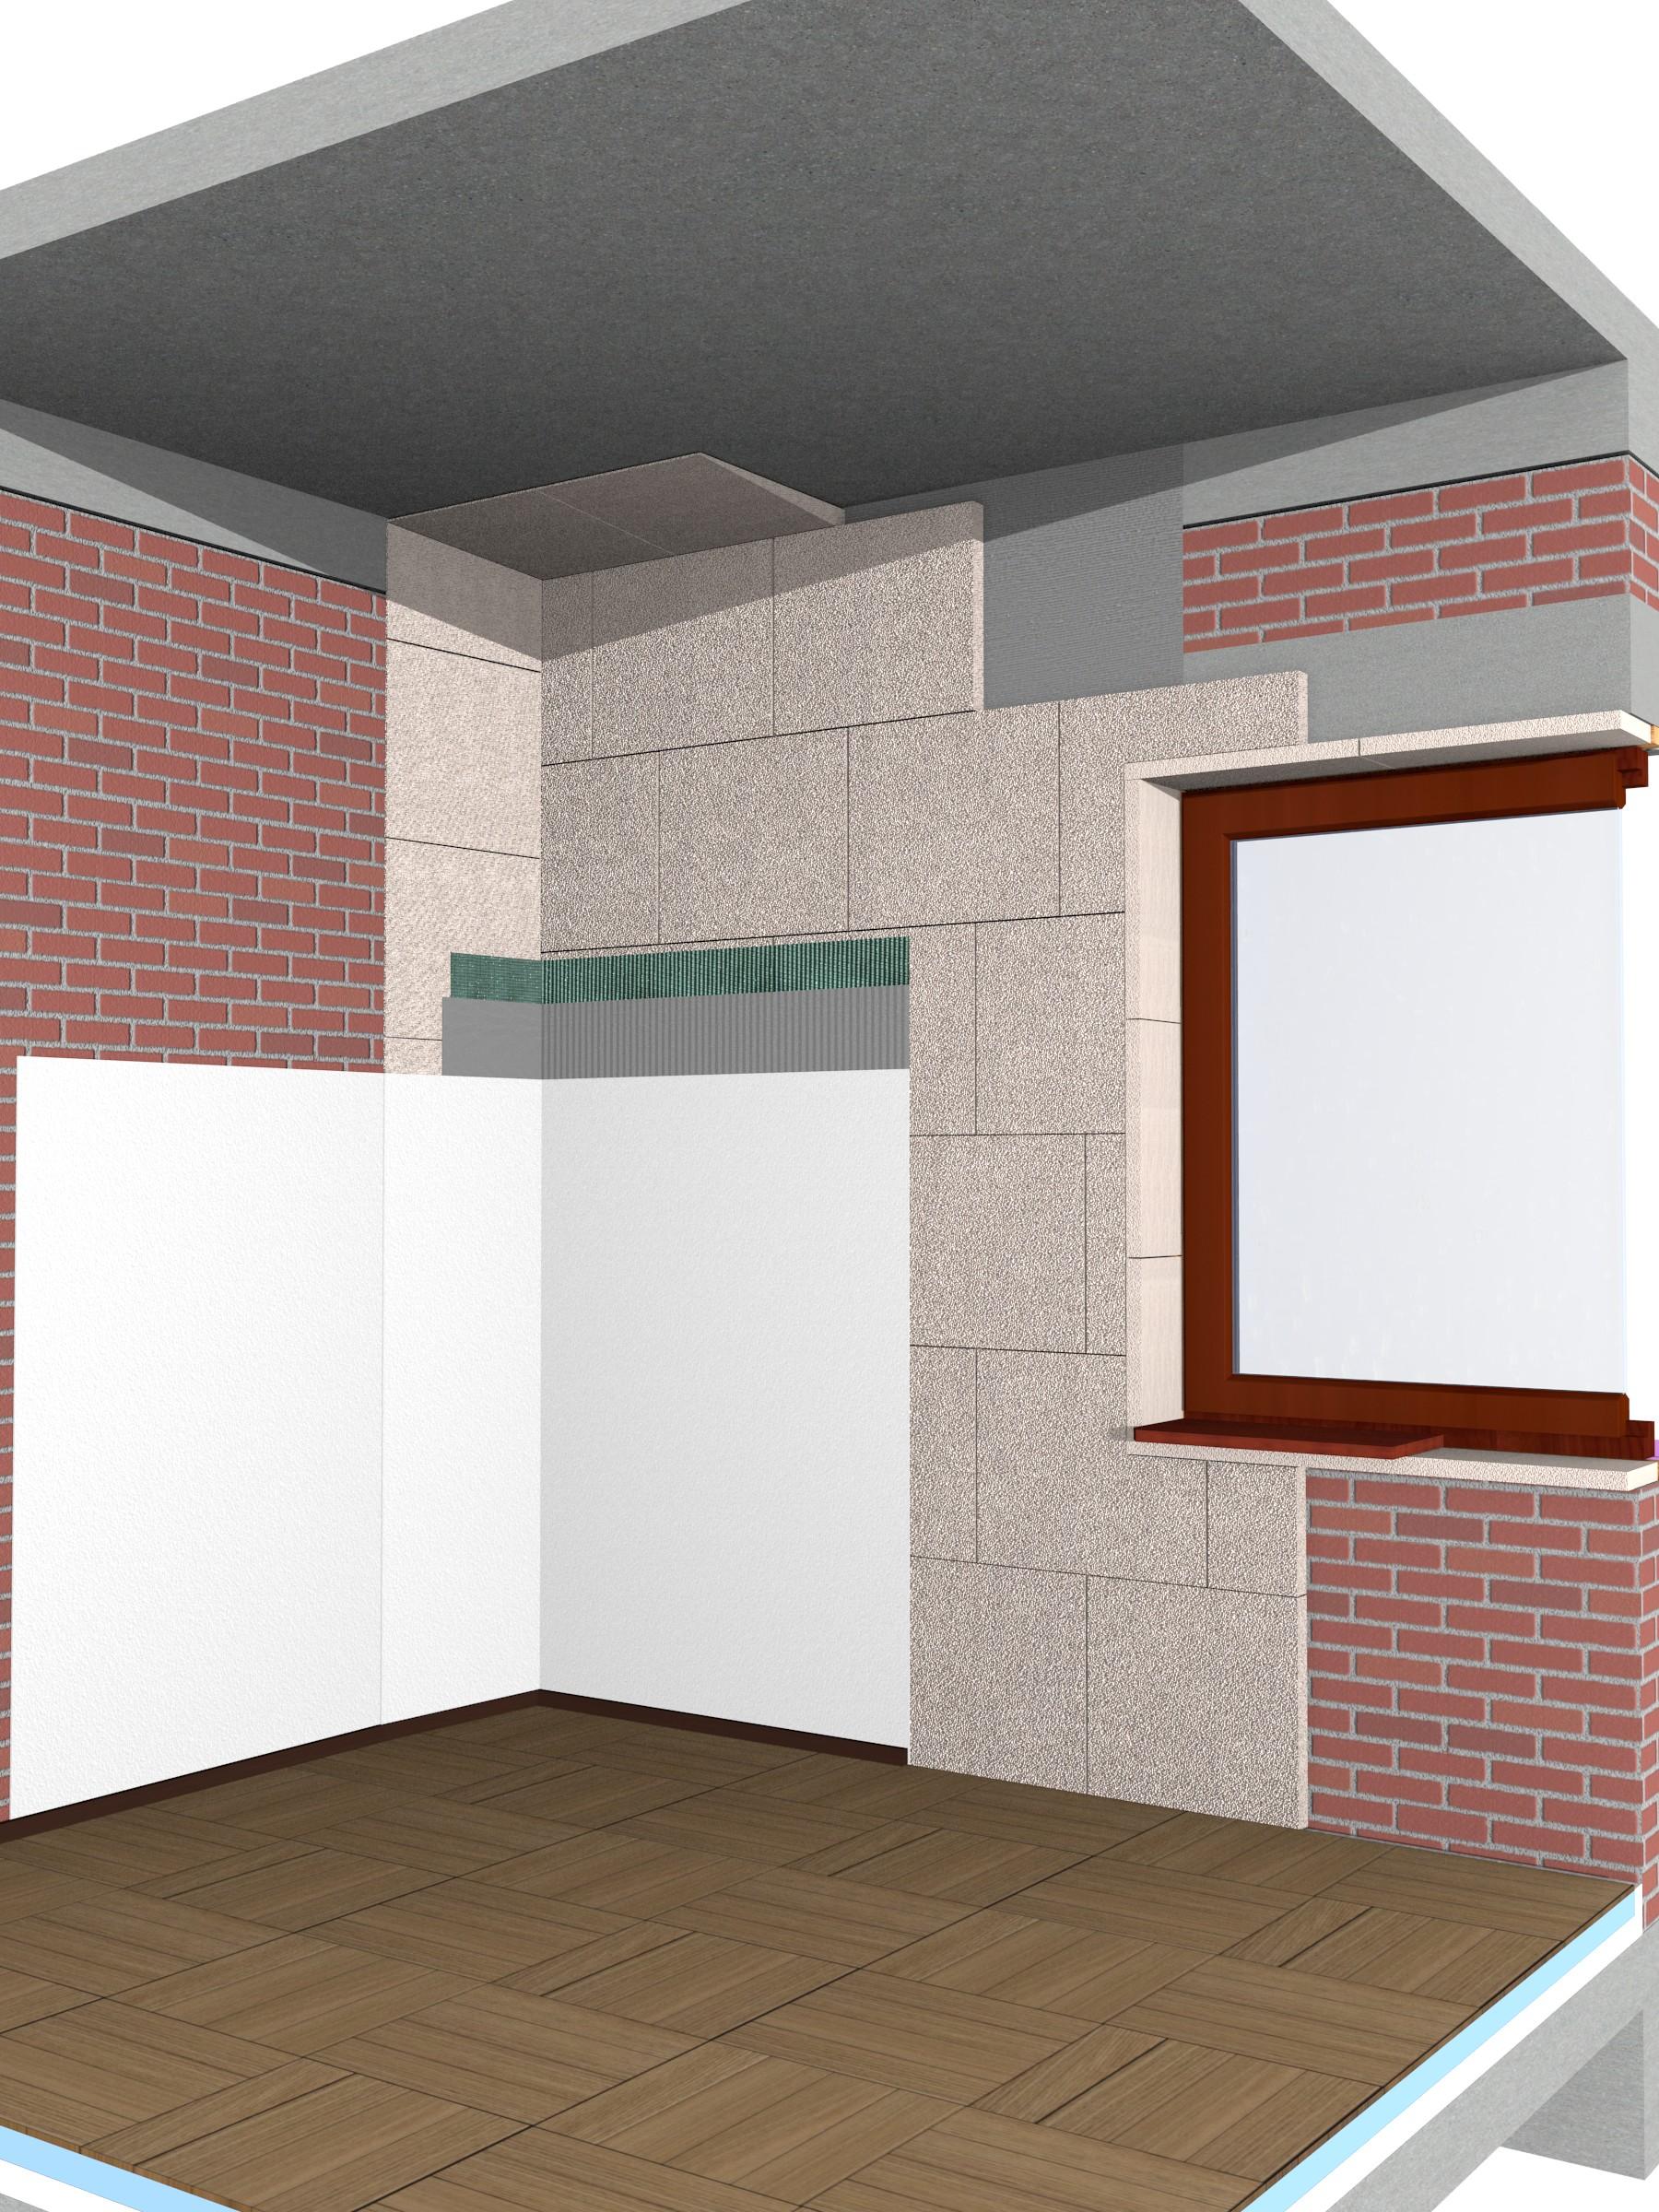 Detaliu reabilitare termica la interior cu termoizolatie minerala Multipor - Termoizolarea si reabilitarea termica a peretilor de exterior si interior